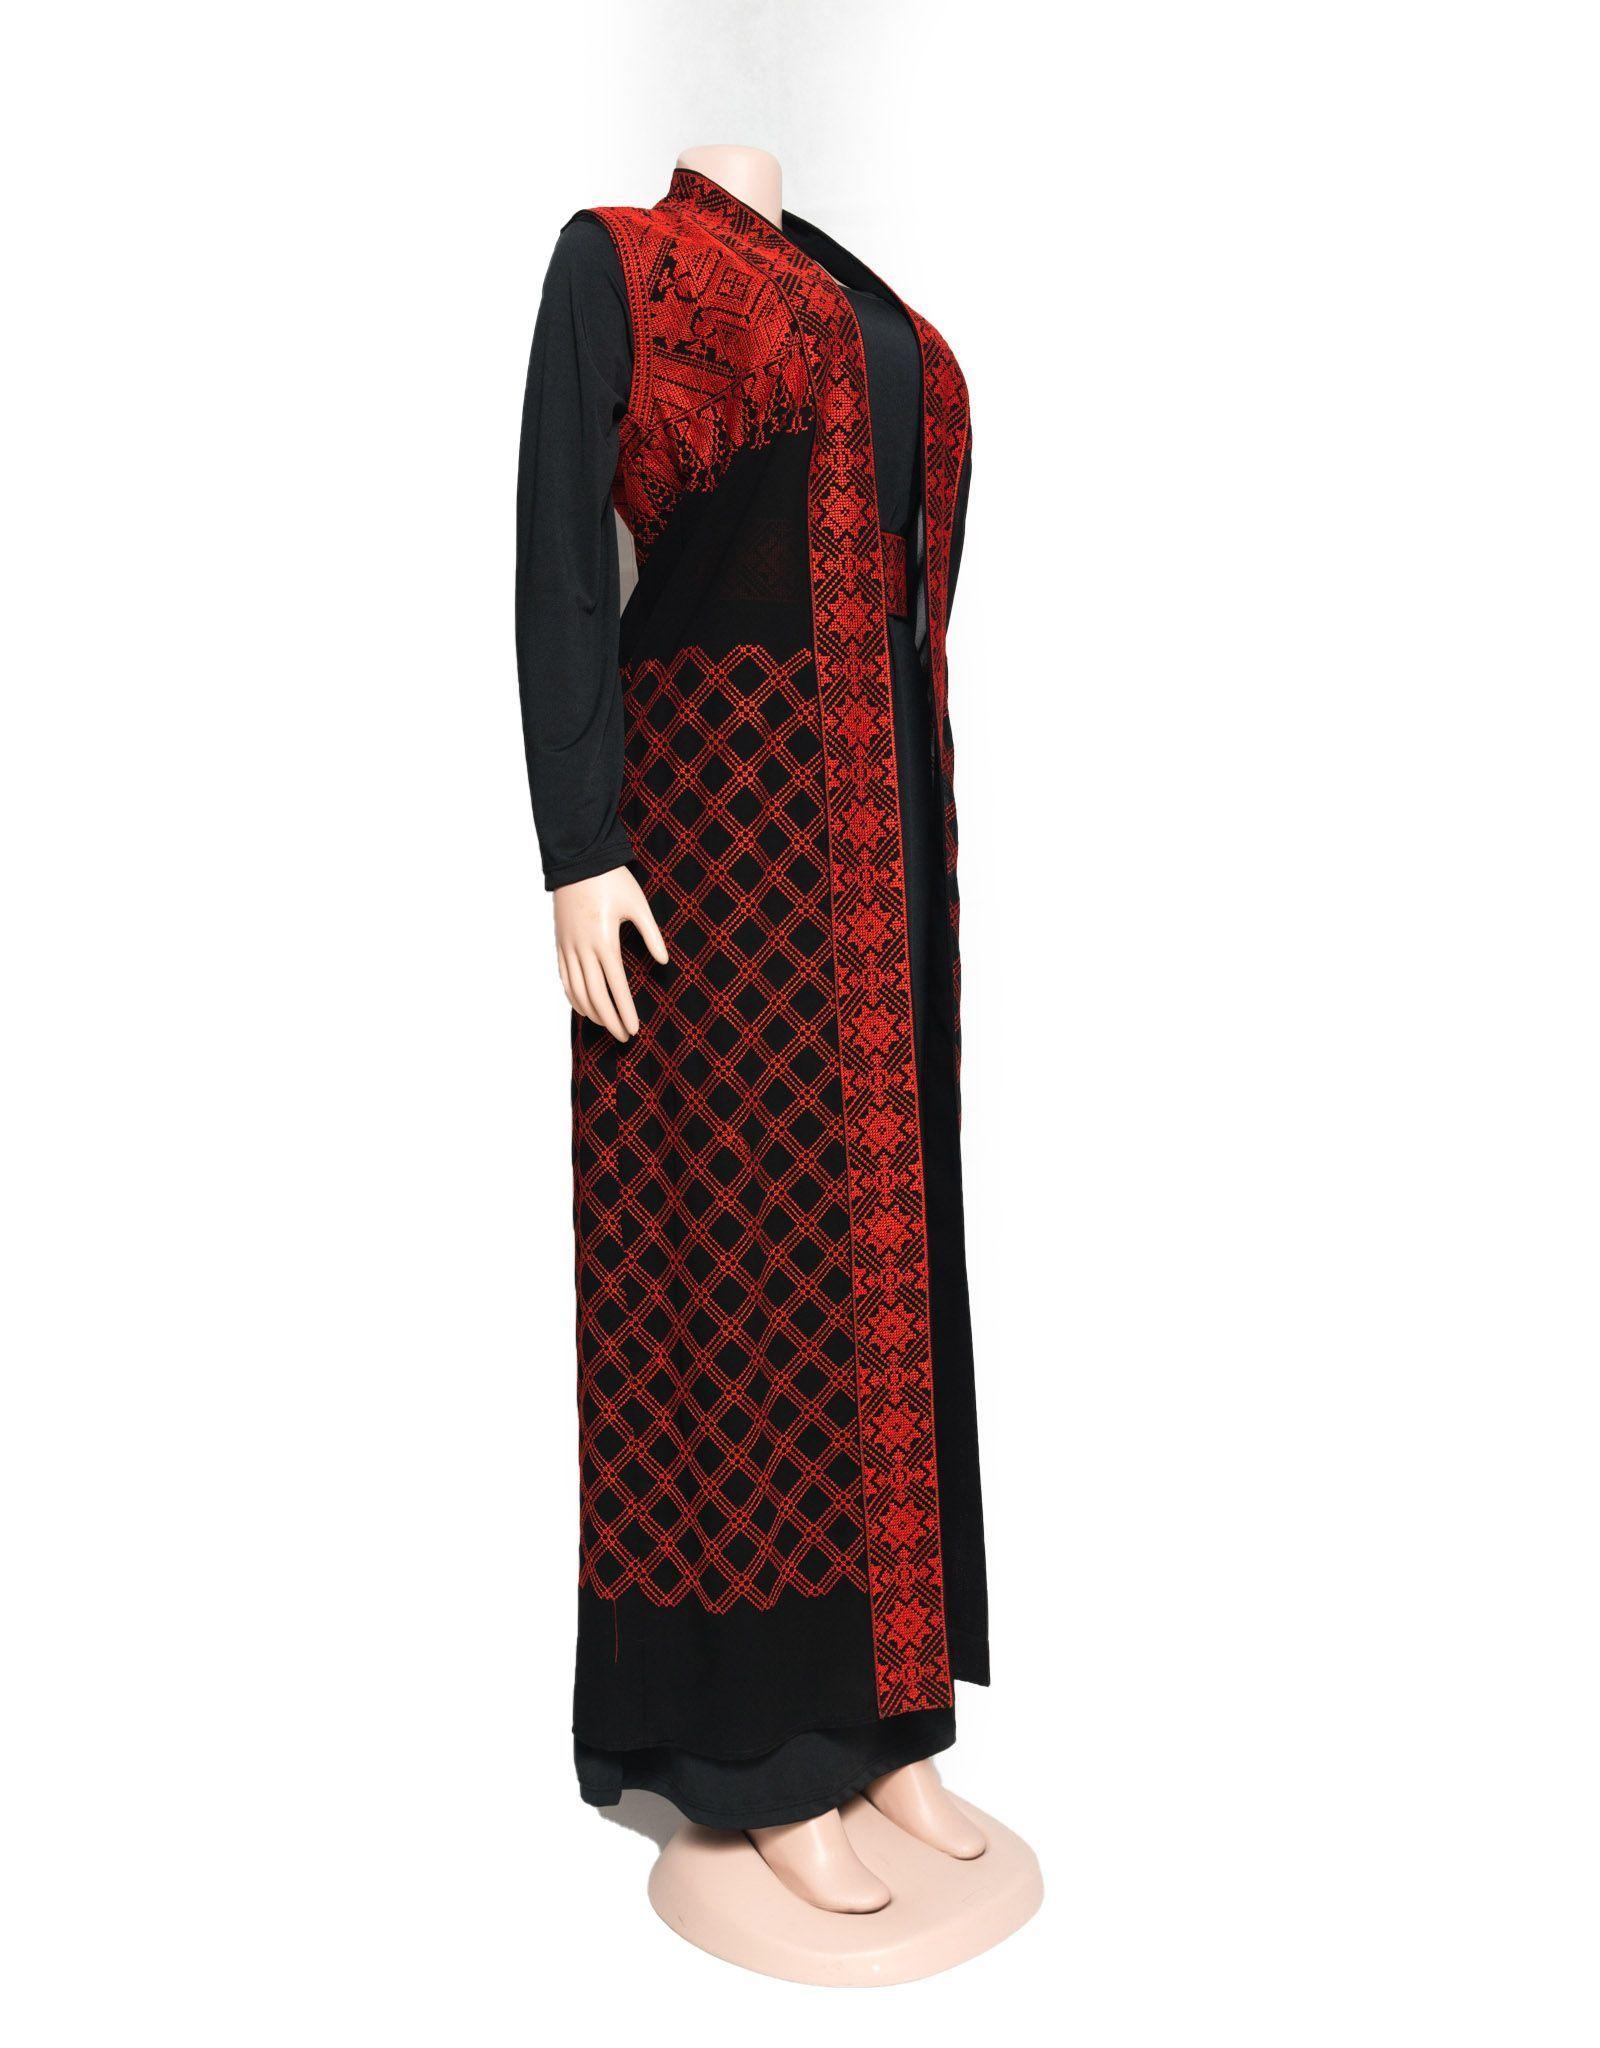 81637f26fb Black and red embroidered maxi sleeveless jacket abaya | Falastini Brand